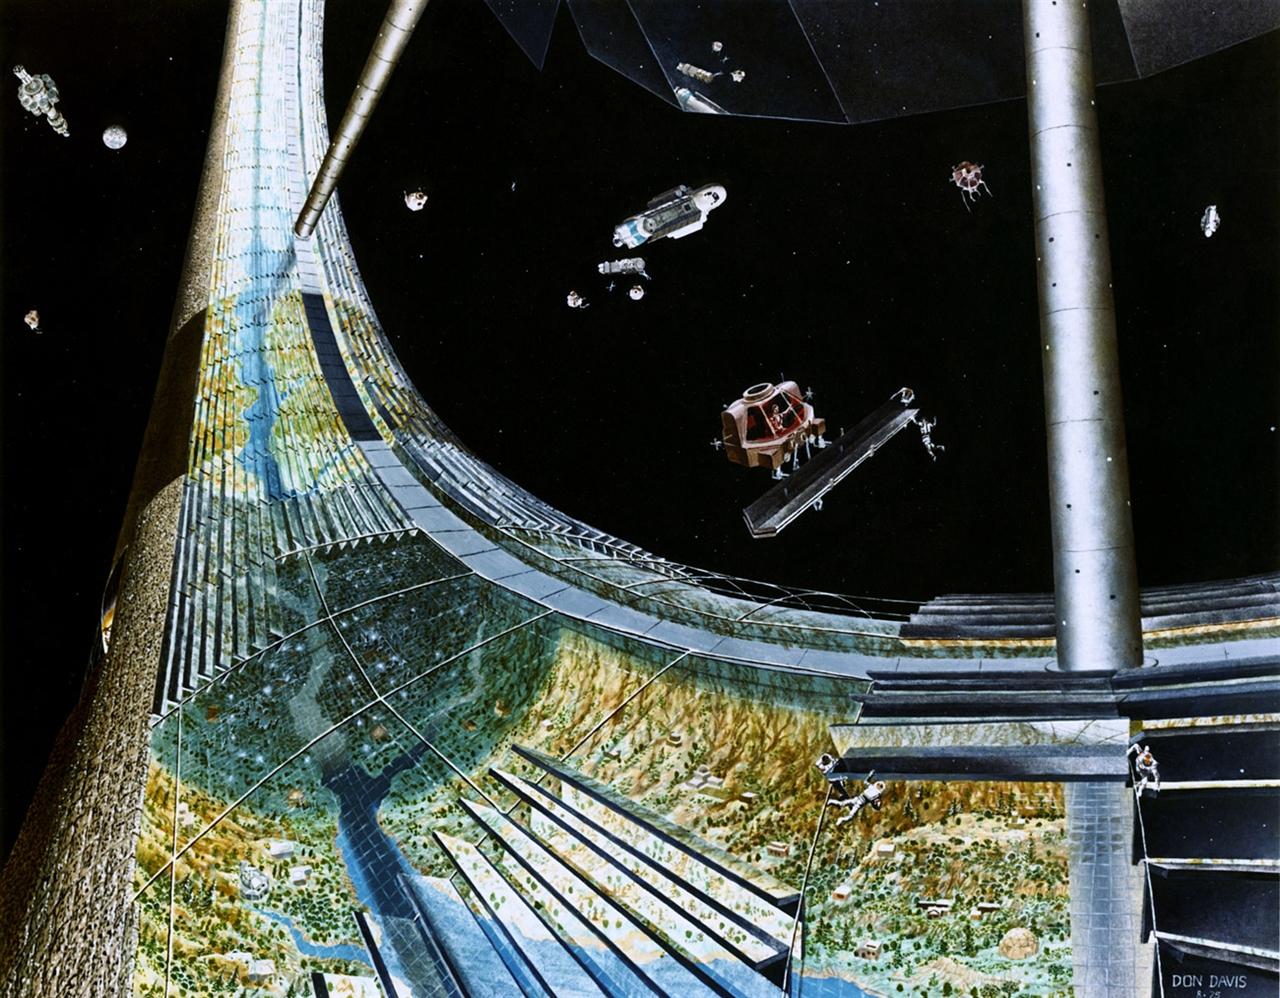 Donald Davis Nasa Space Colony #2